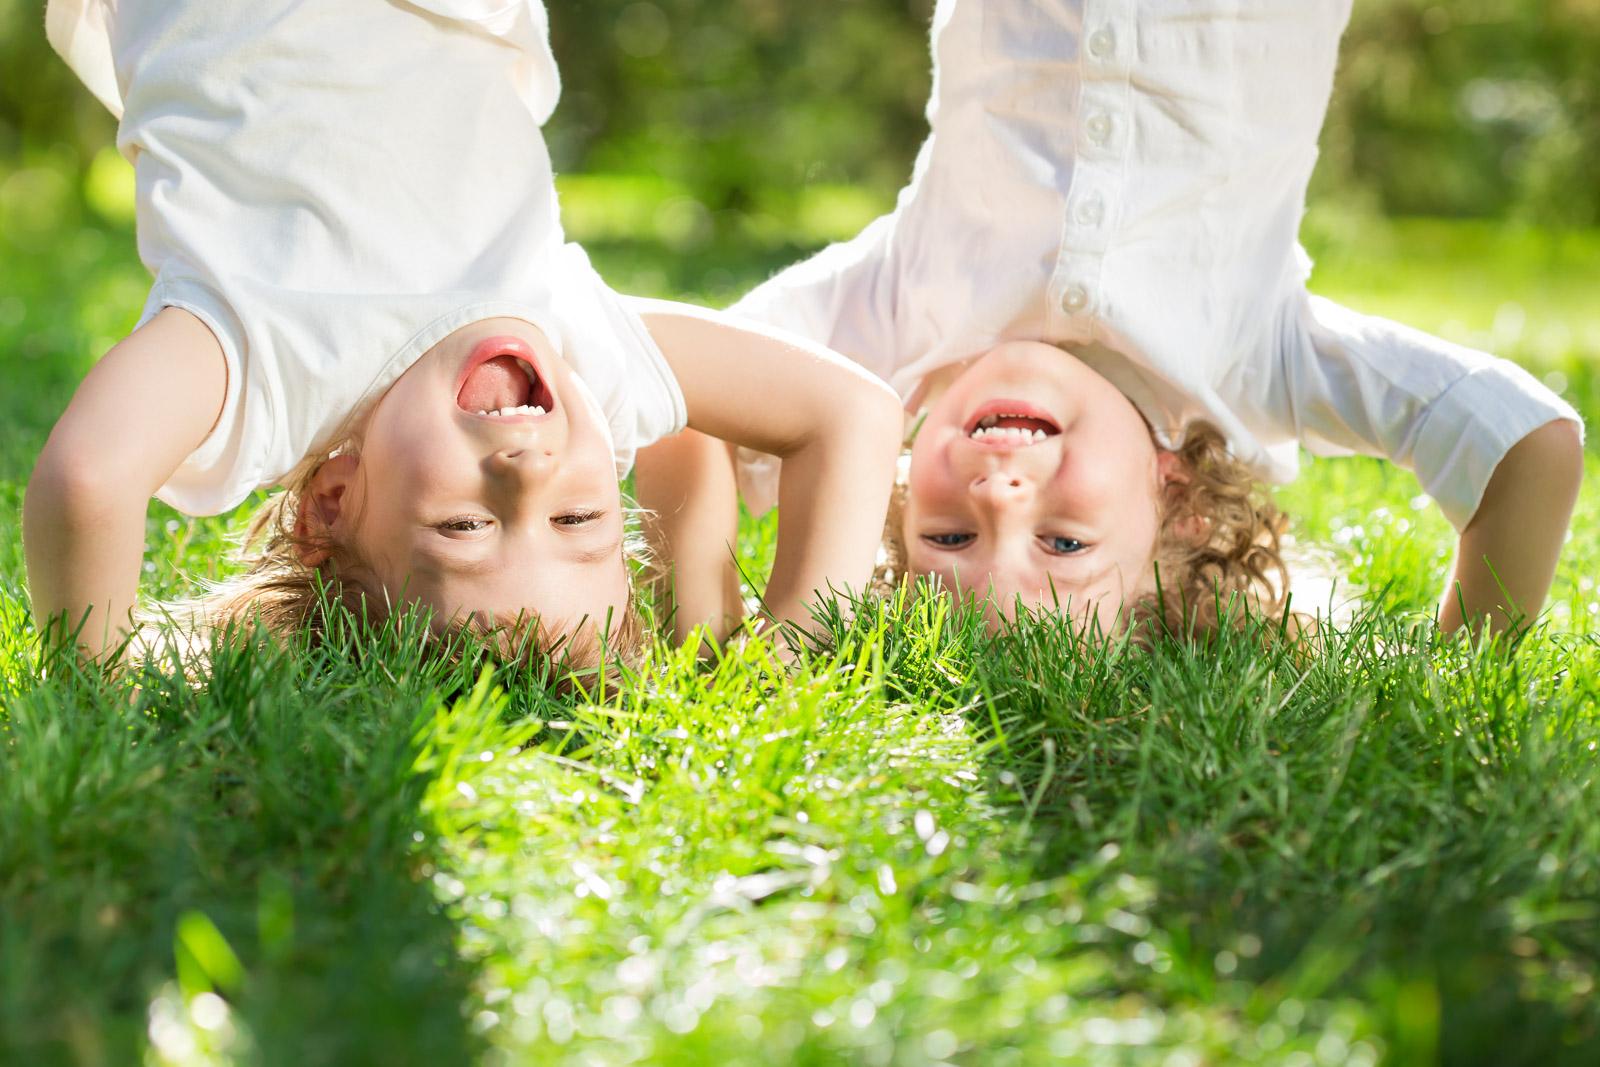 kids playing grass